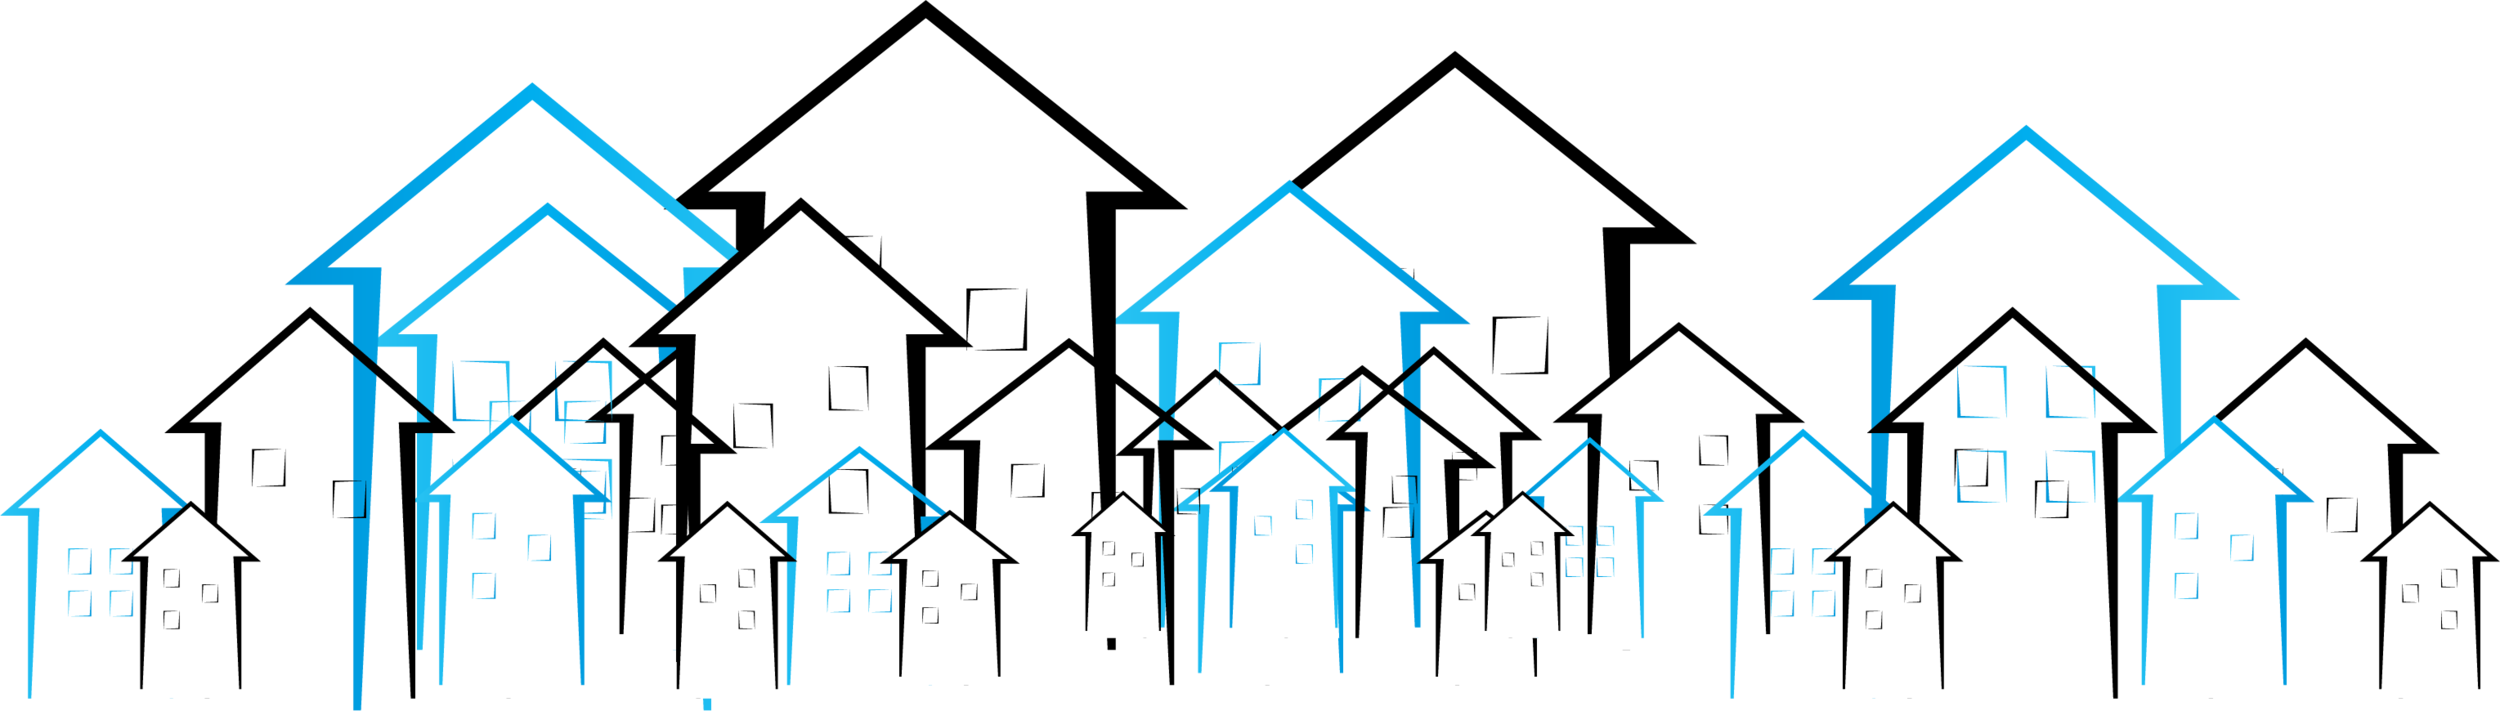 RealEstate-Value-01.png